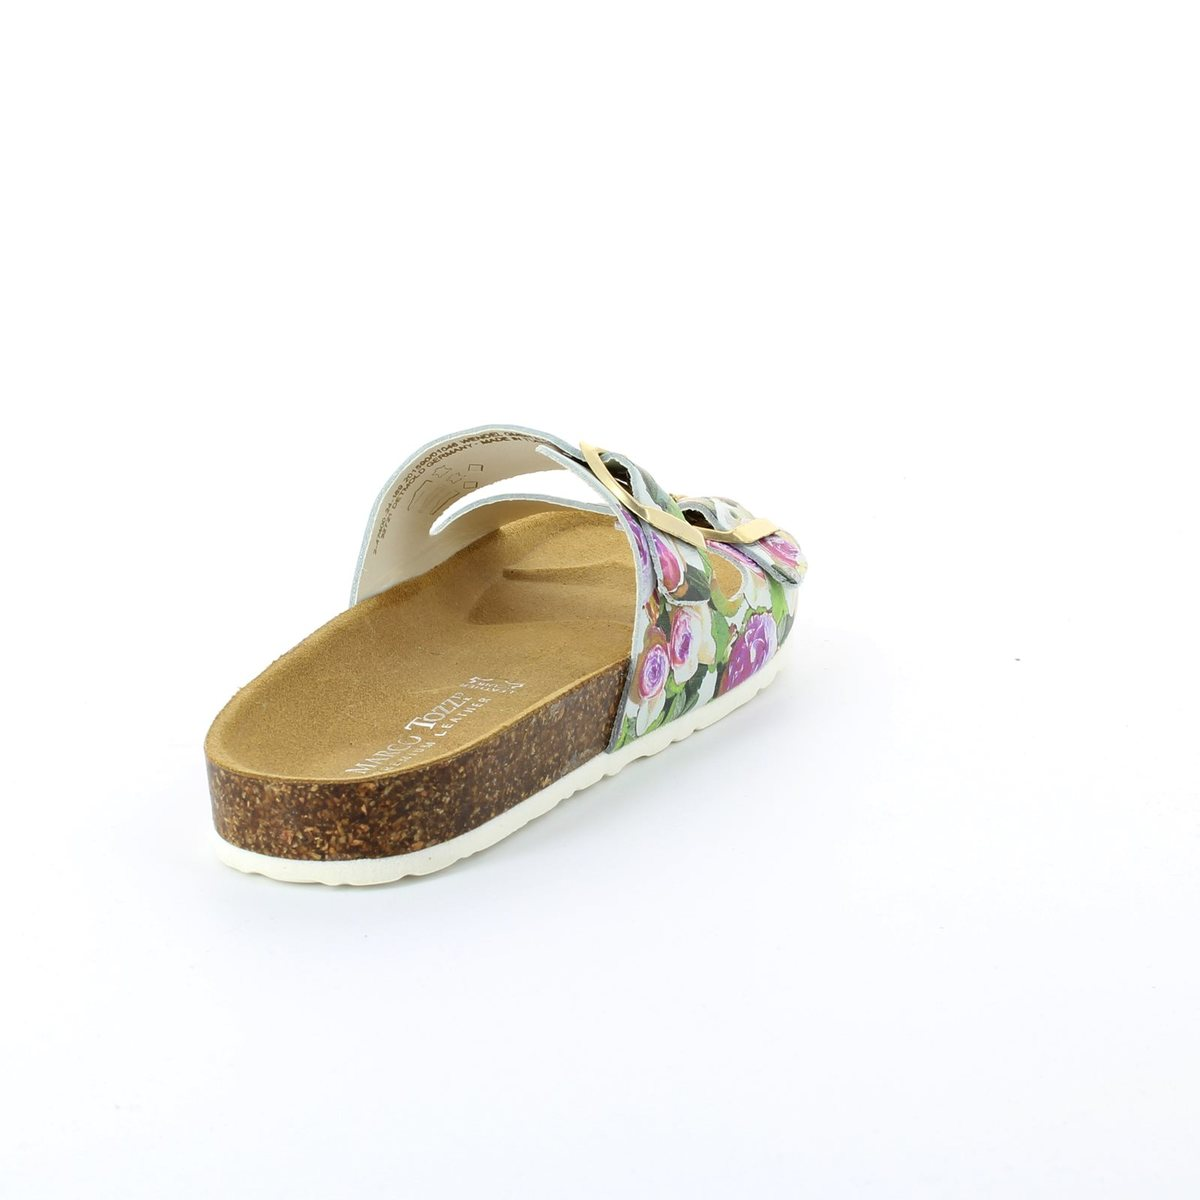 marco tozzi bio 27504 189 floral sandals. Black Bedroom Furniture Sets. Home Design Ideas